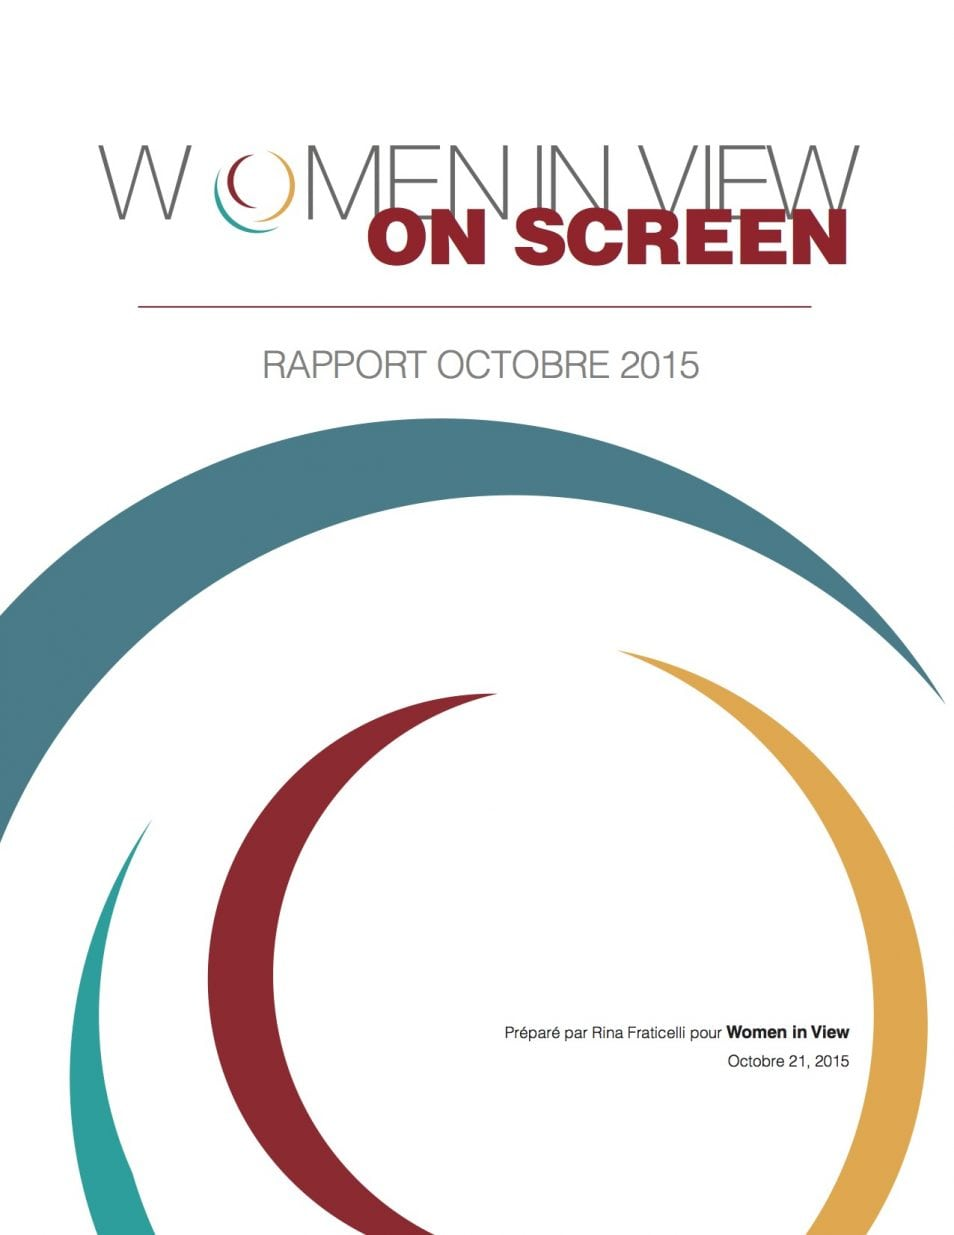 women-in-view-on-screen-octobre-2015-1